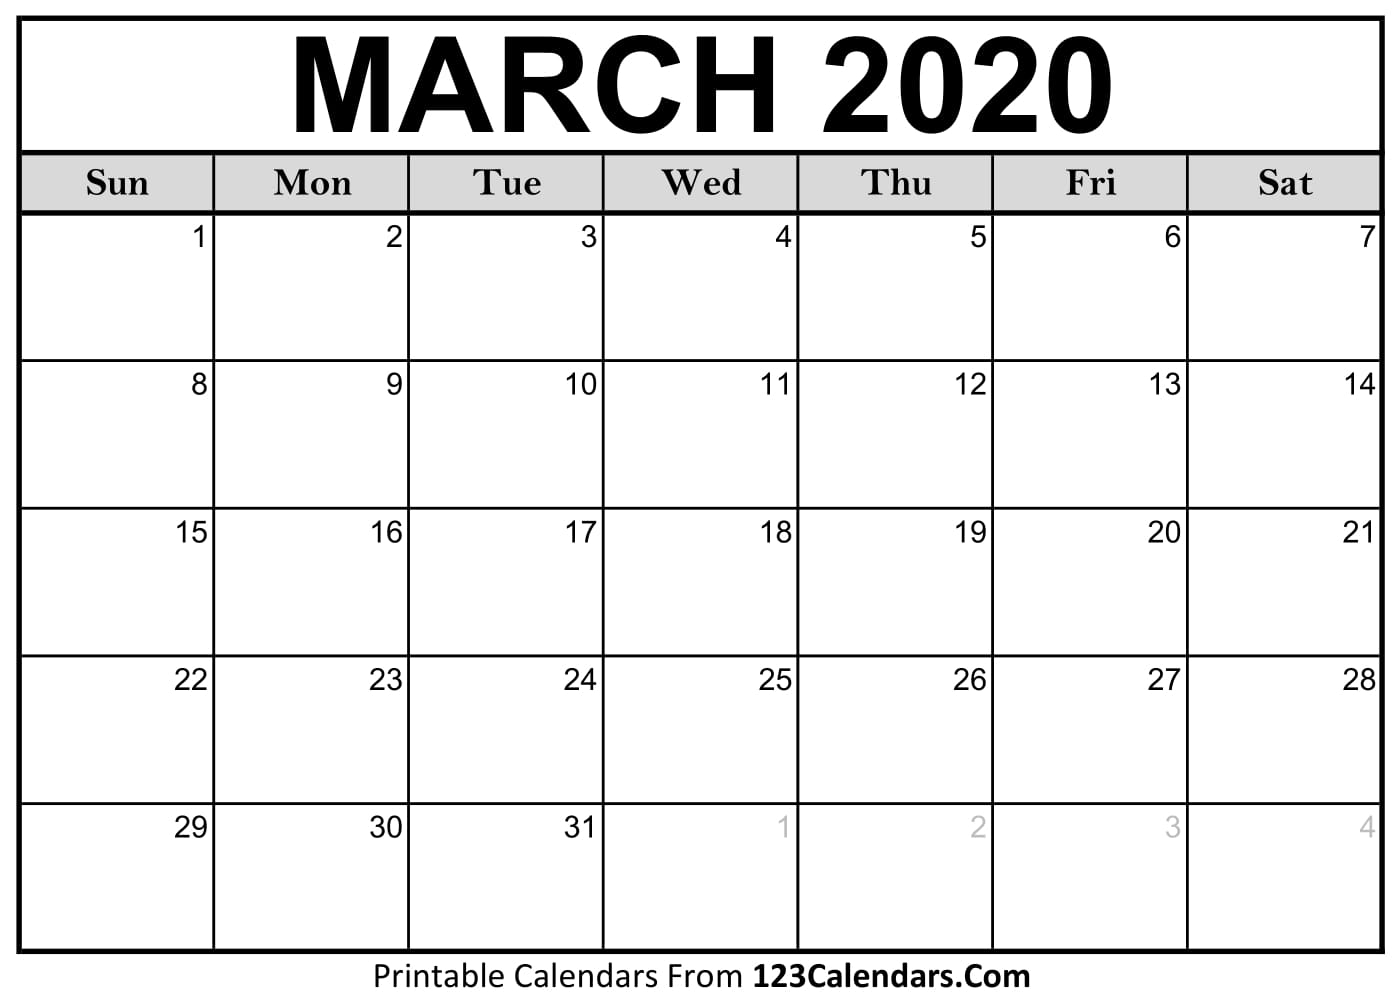 Calendar Month March 2020 - Wpa.wpart.co